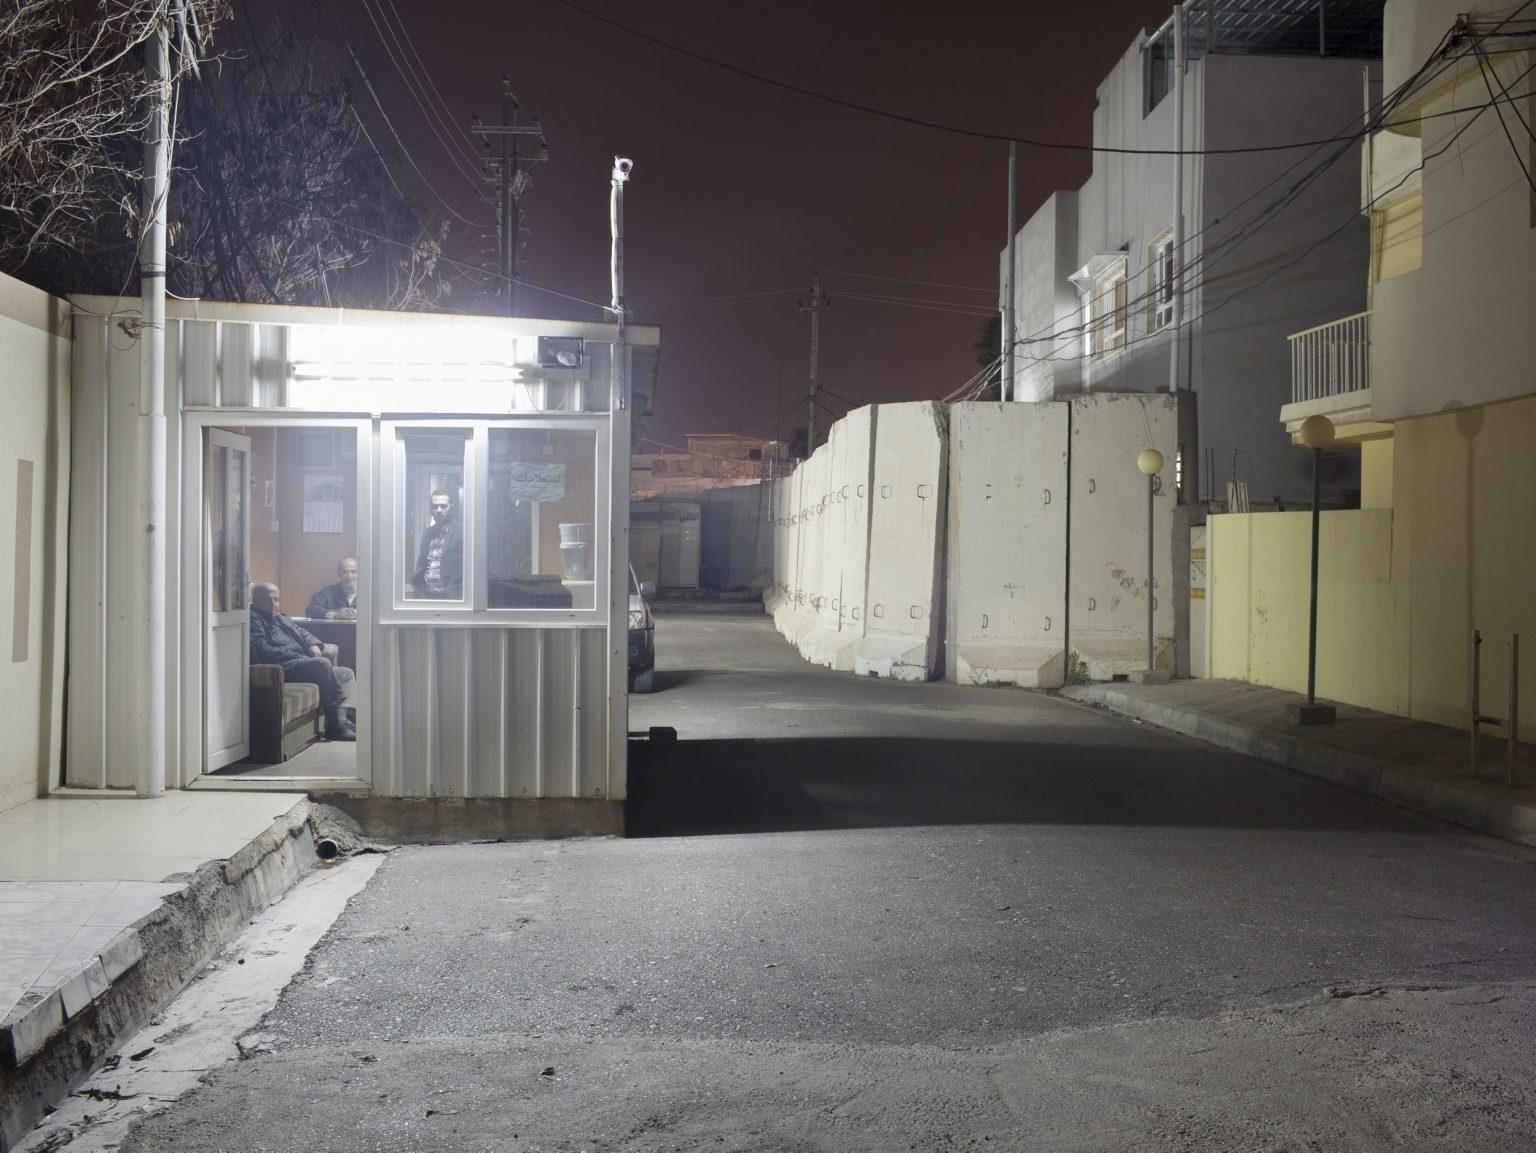 Protective walls at the entrance of the Ishater TV, a Christian television based in Ankawa, Erbil.